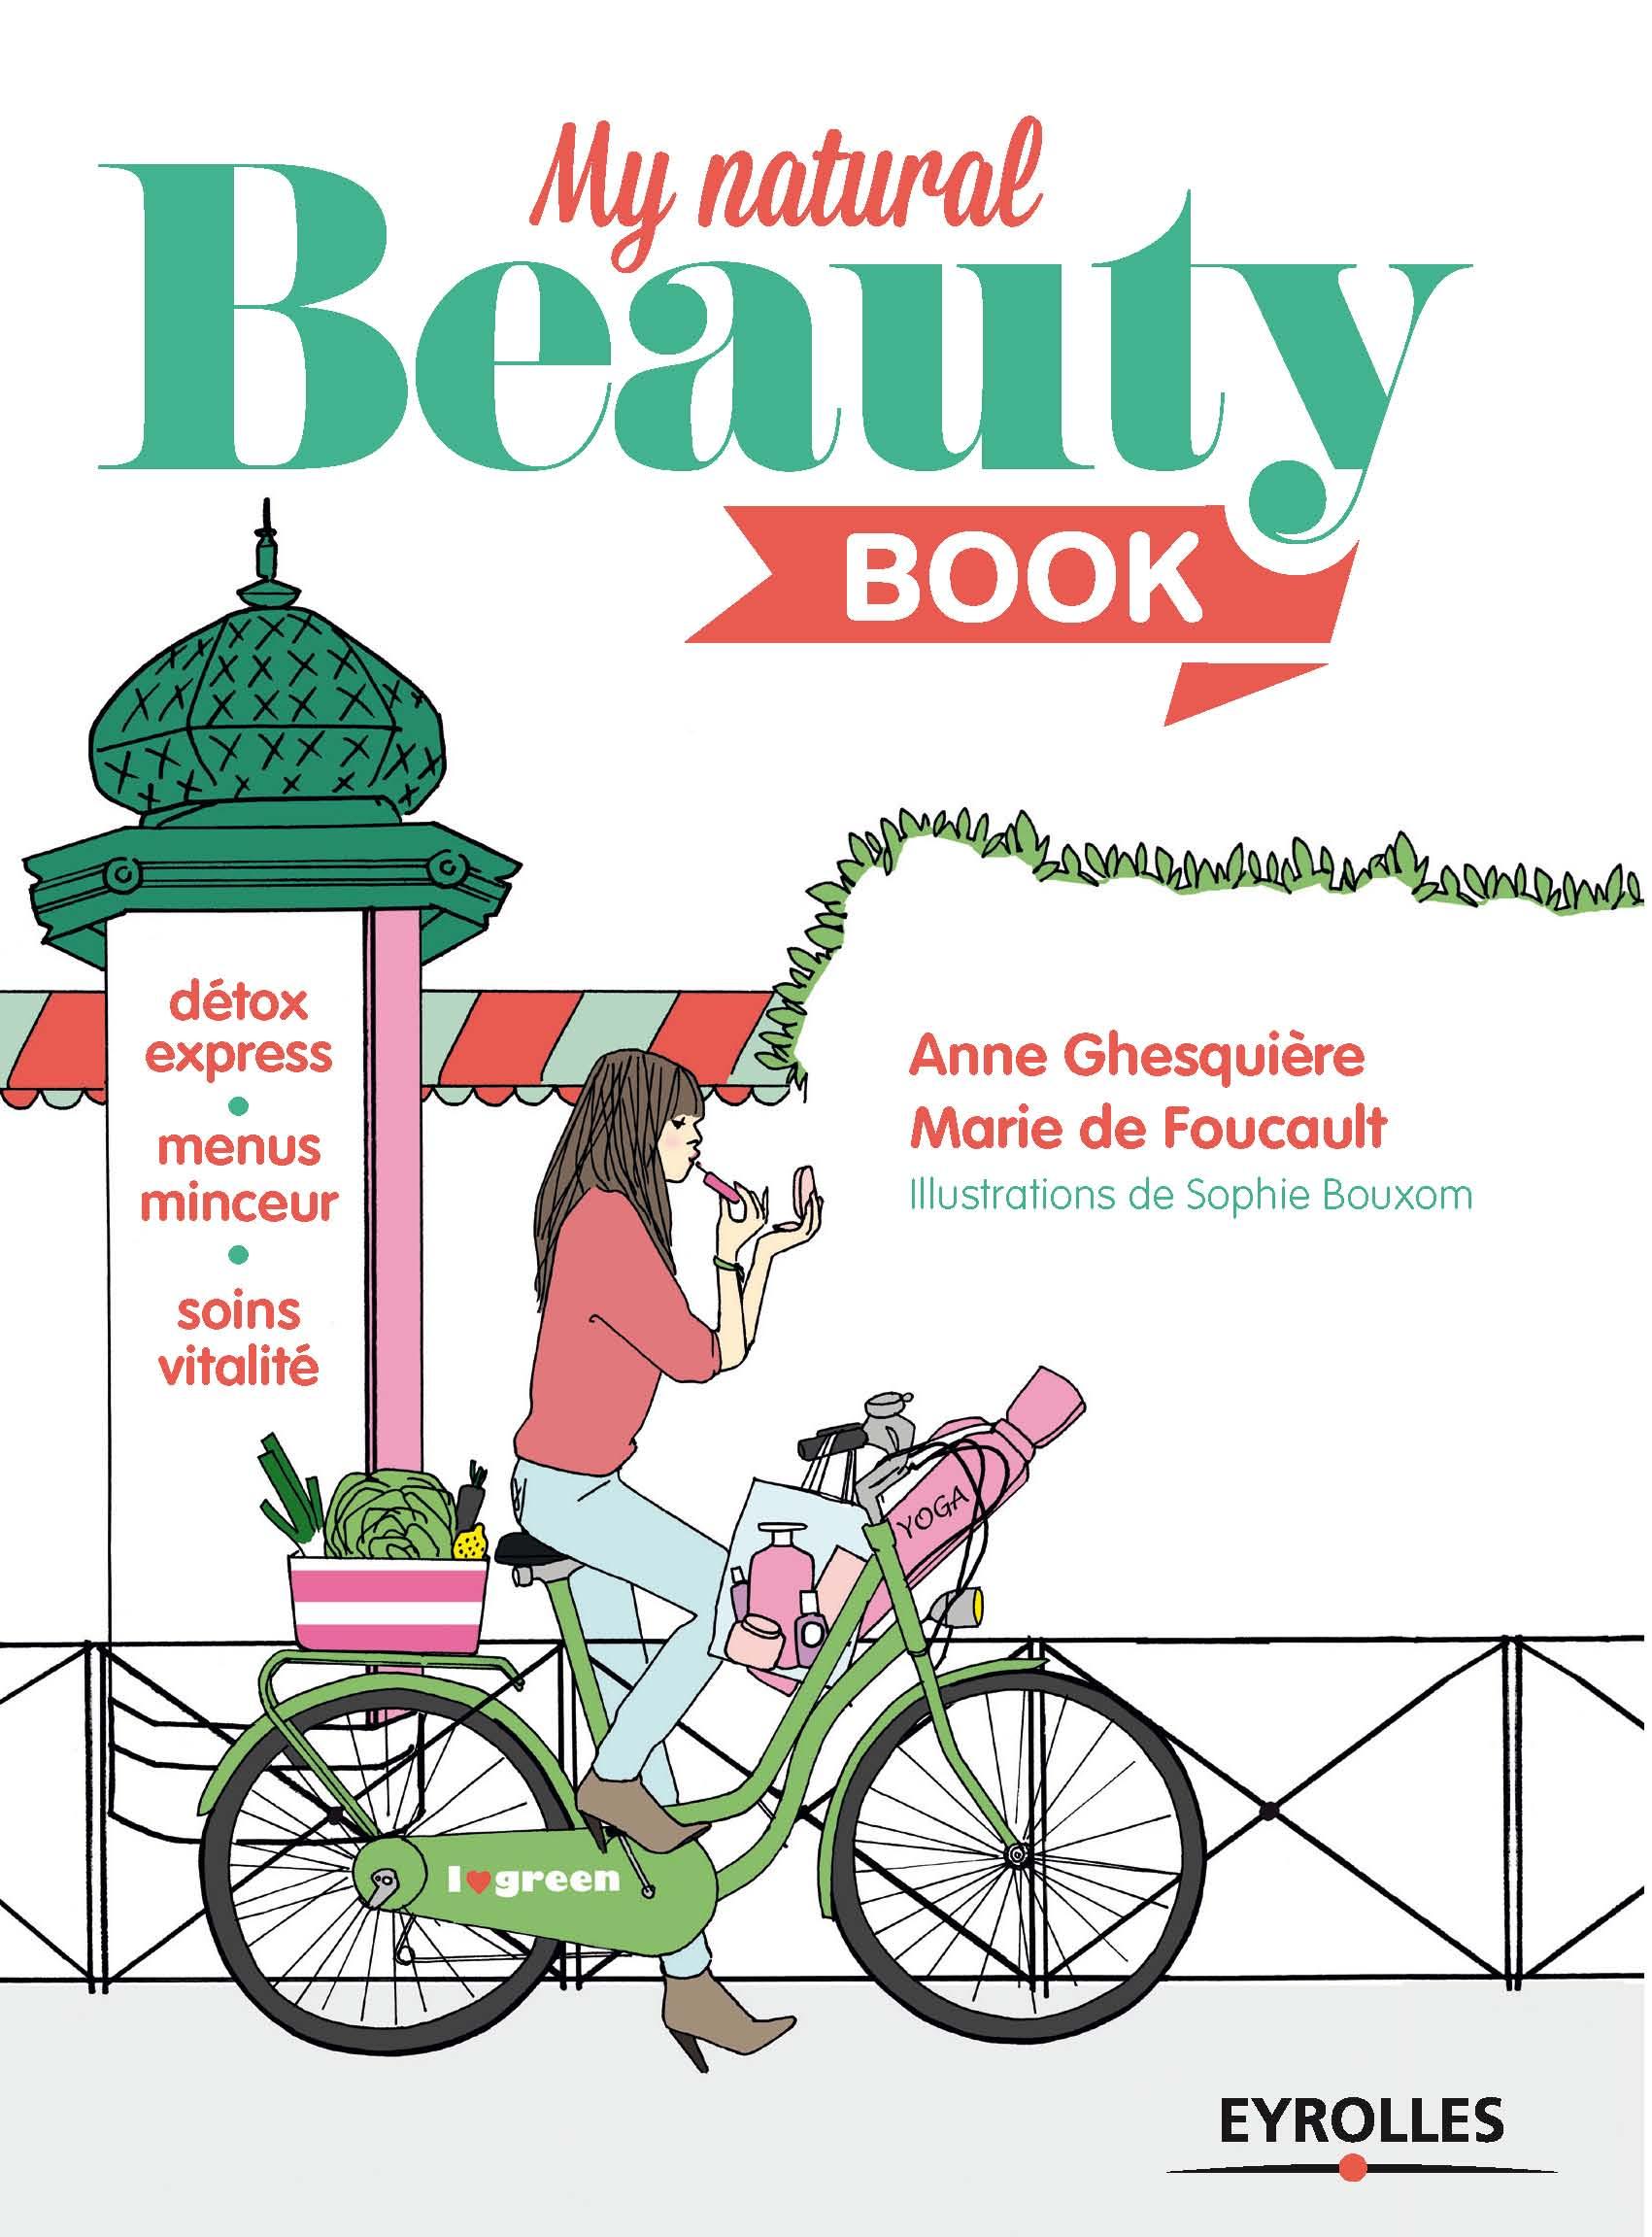 My natural beauty book, Anne Ghesquiere, femininbio